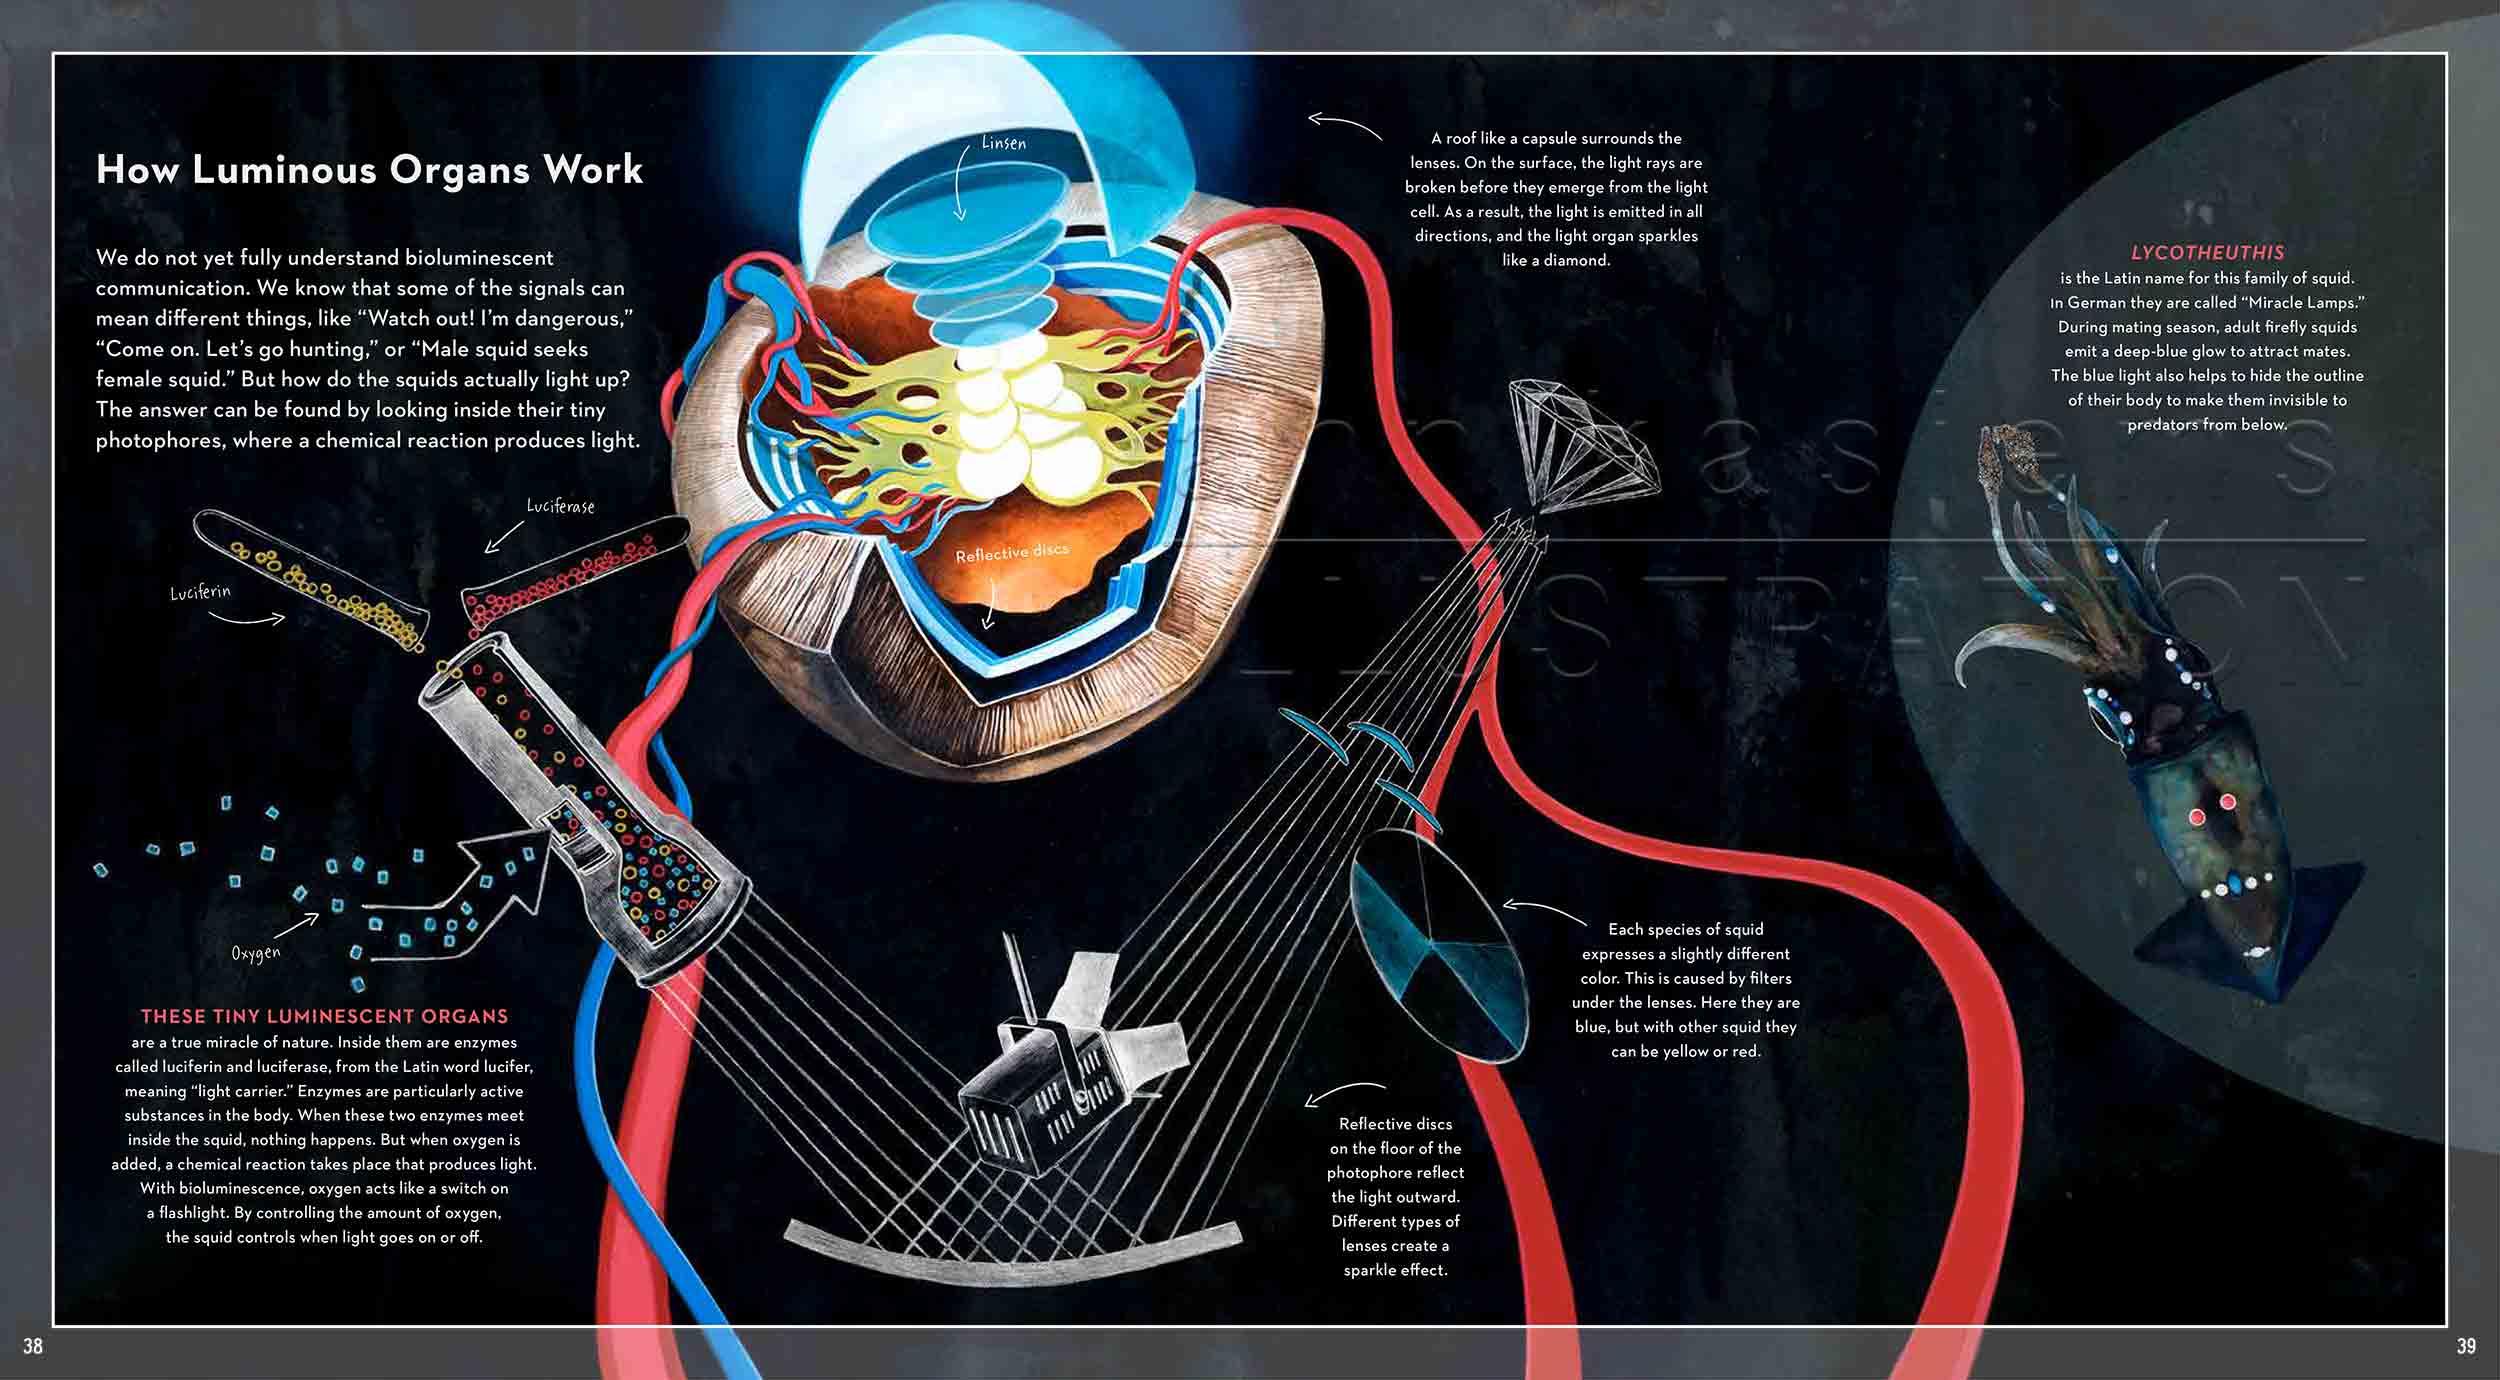 38-39-Leuchtorgan-bioluminescence-infografic-Leuchtkalmar-fireflysquidfish-fish-deep-sea-Englisch-submersible-©annikasiems-plankton_deepsea-zooplankton.jpg